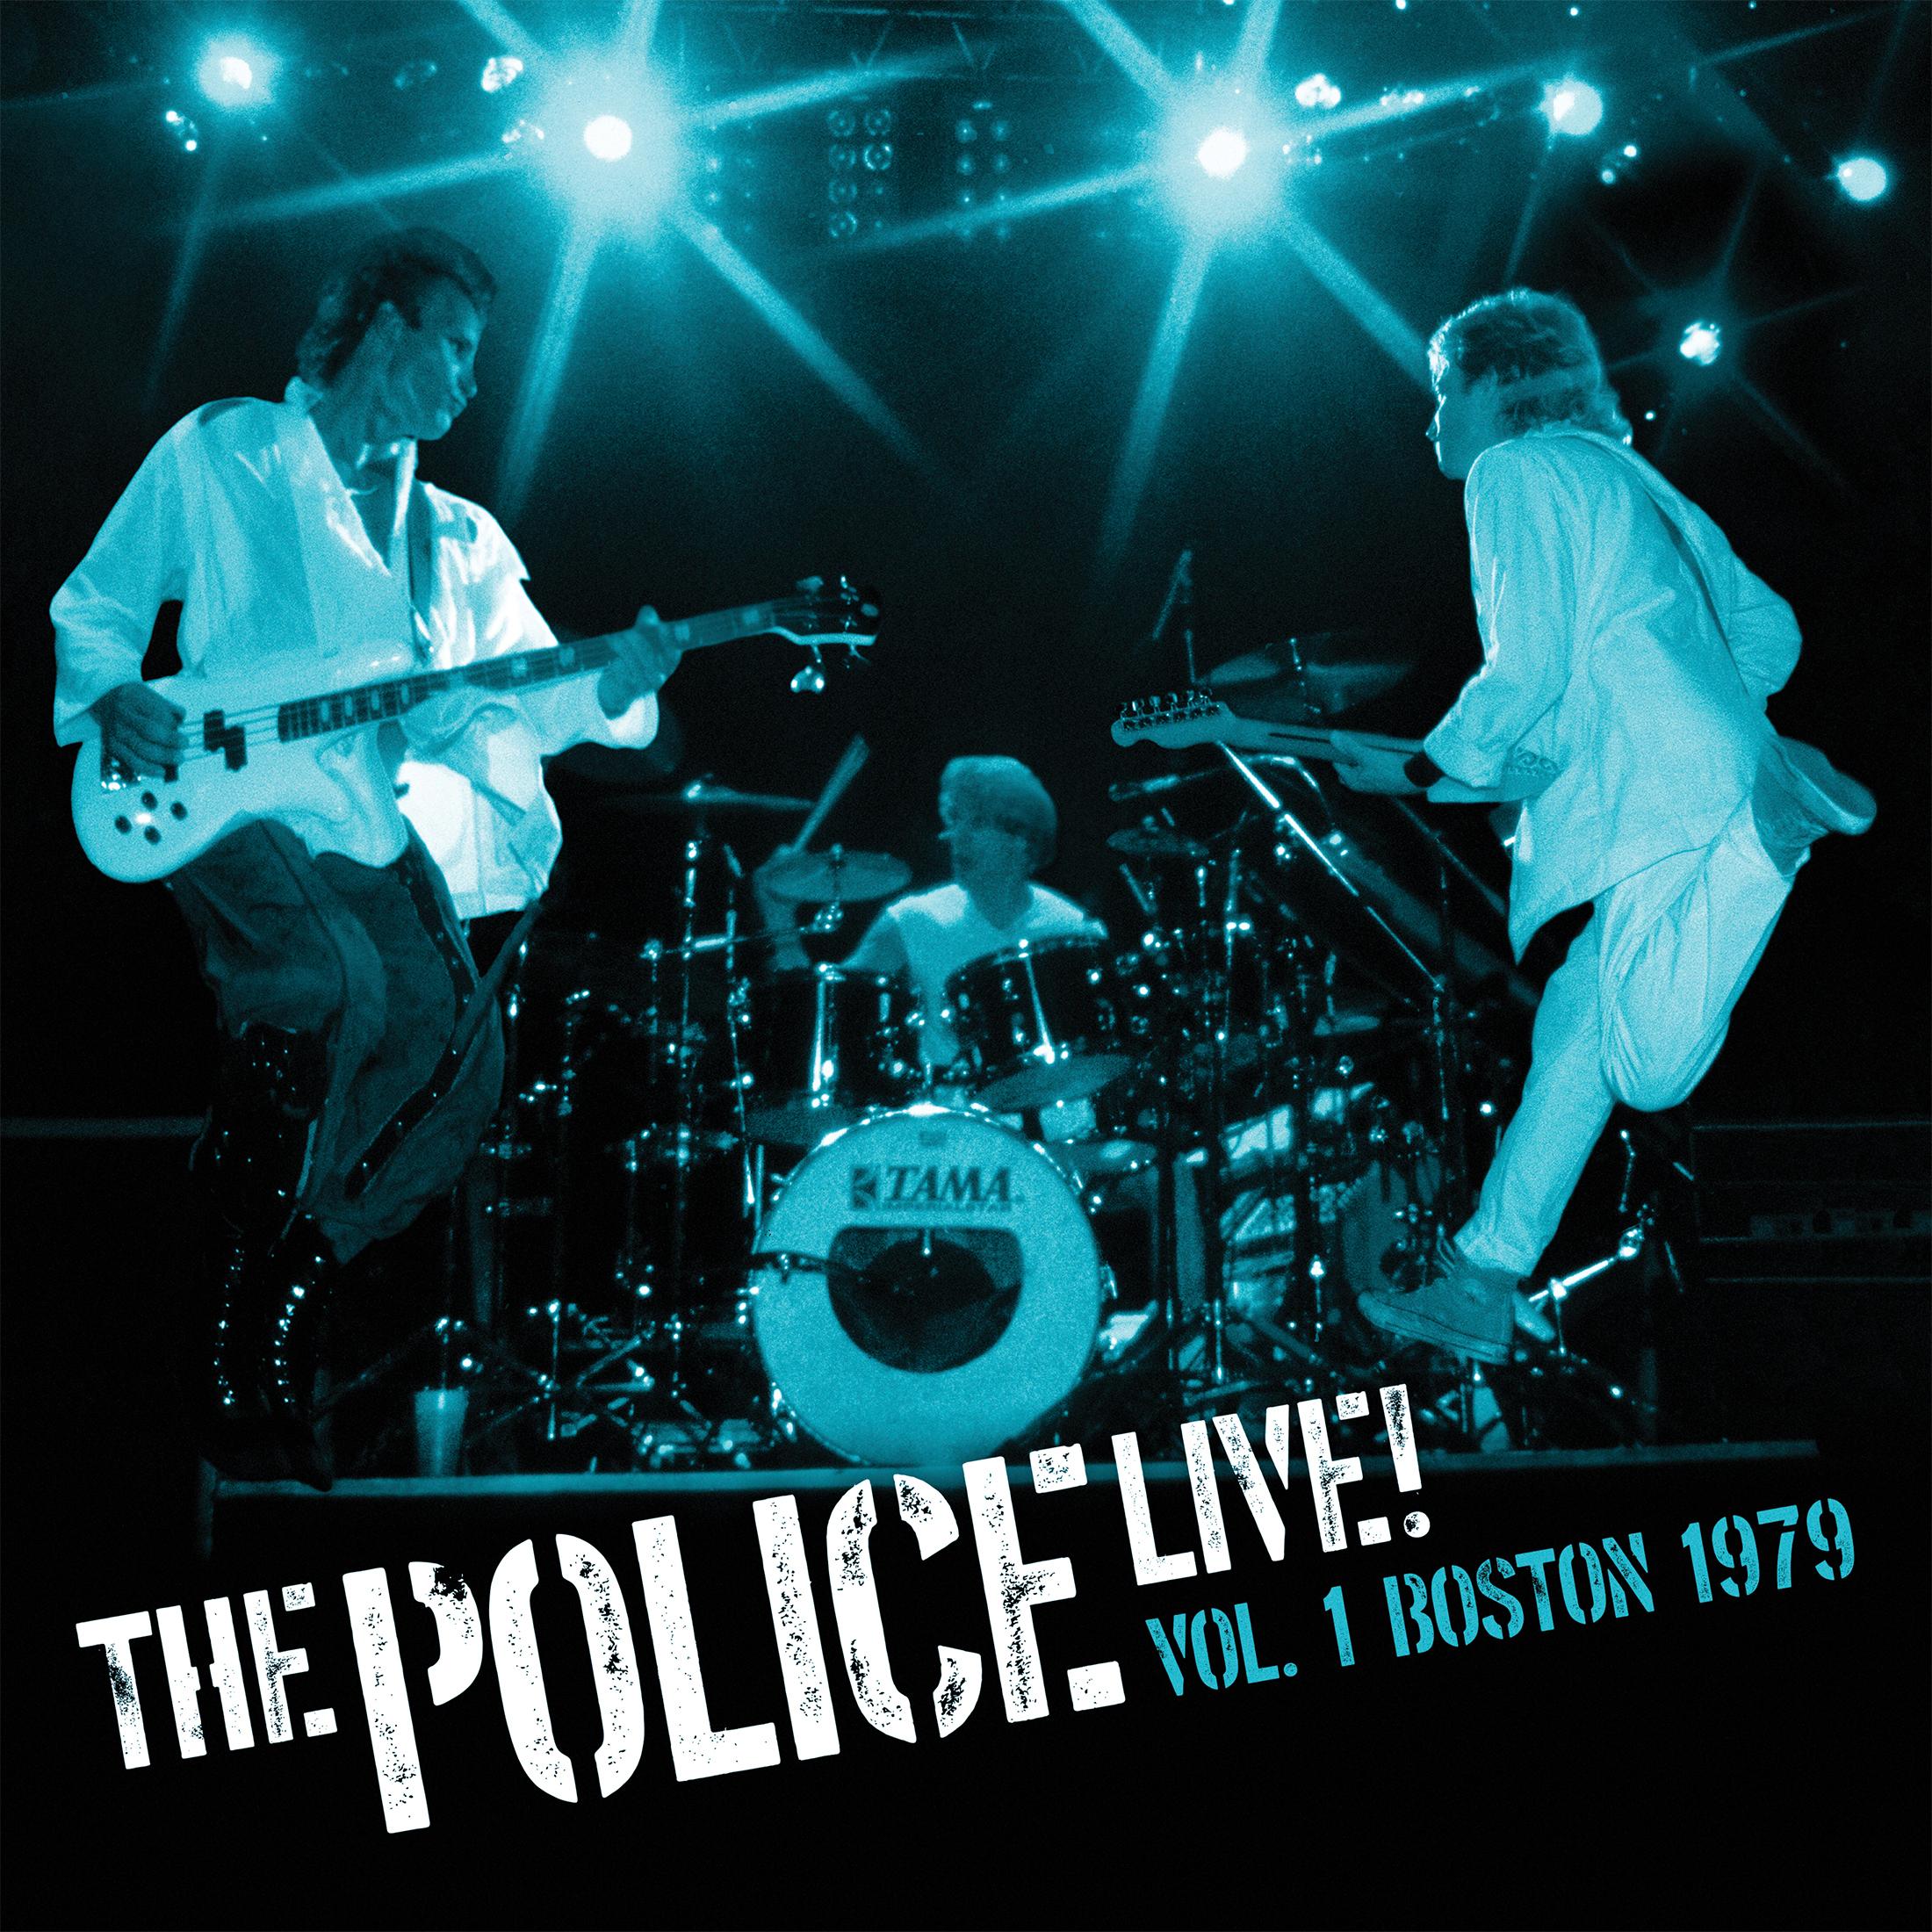 Live Vol.1 Boston 1979 (Coloured vinyl)